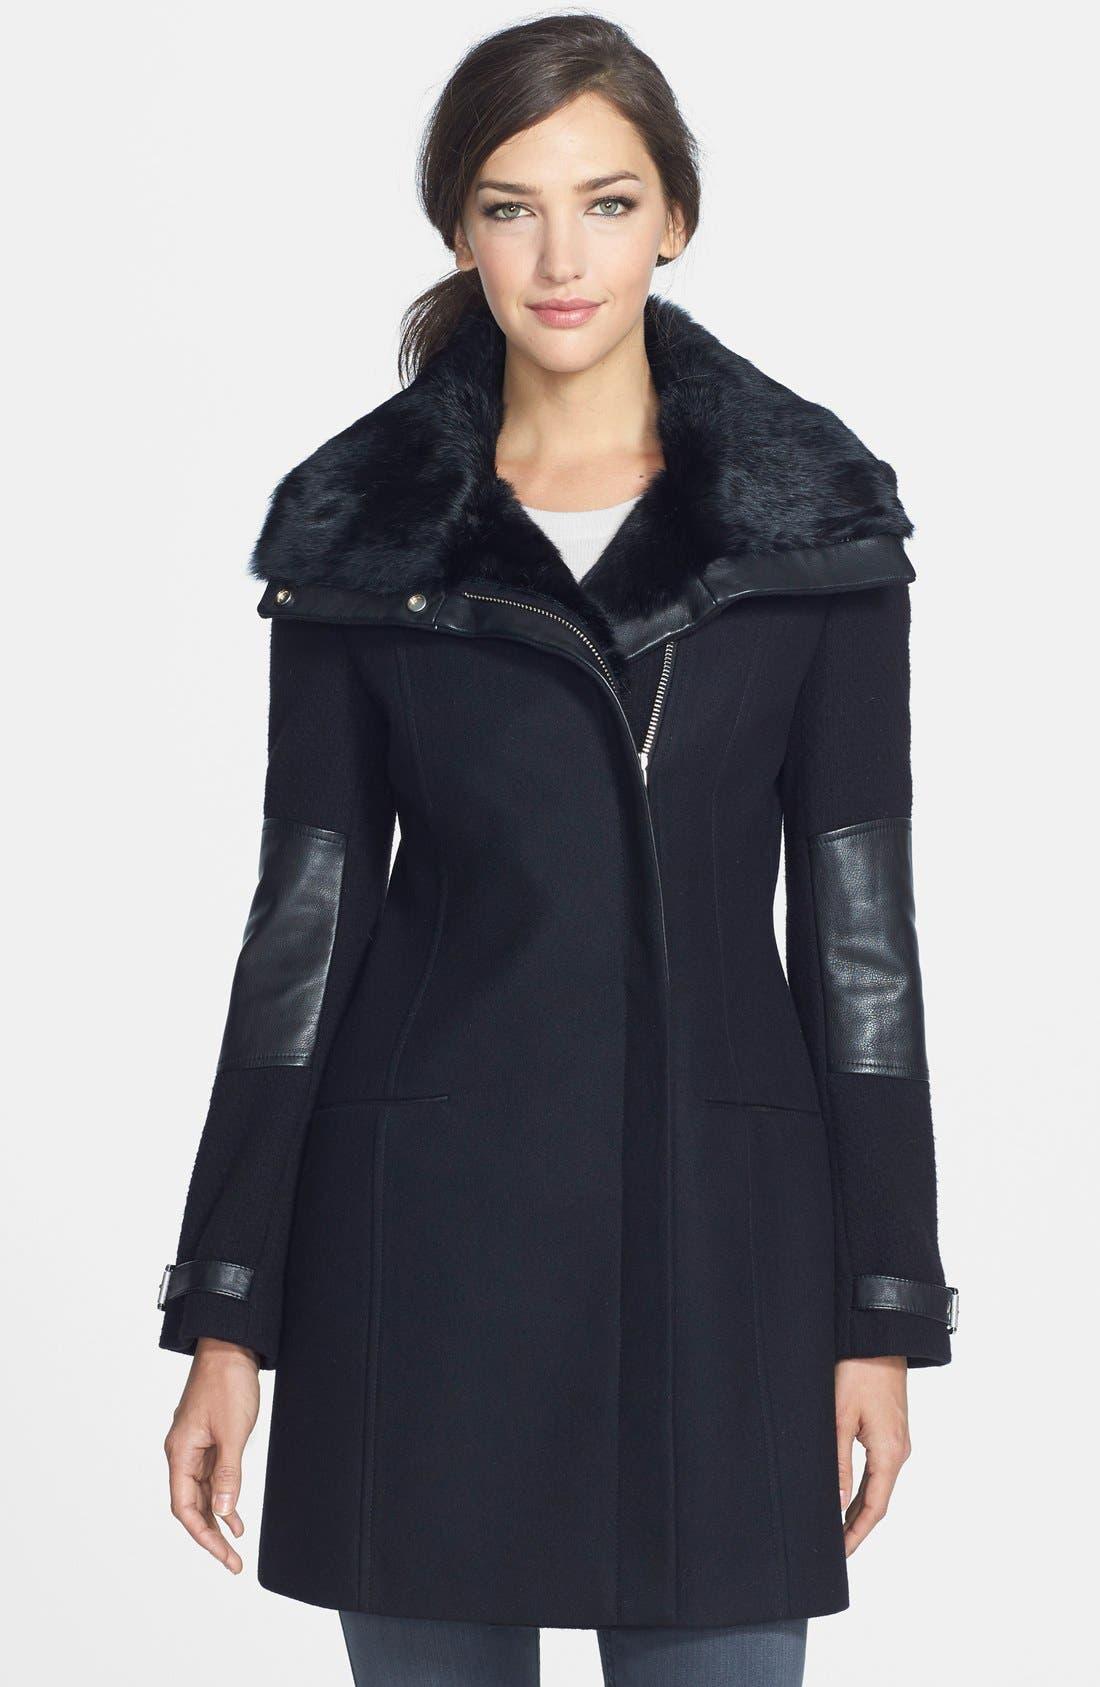 ANDREW MARC 'Mara' Genuine Rabbit Fur & Leather Trim Wool Blend Coat, Main, color, 001